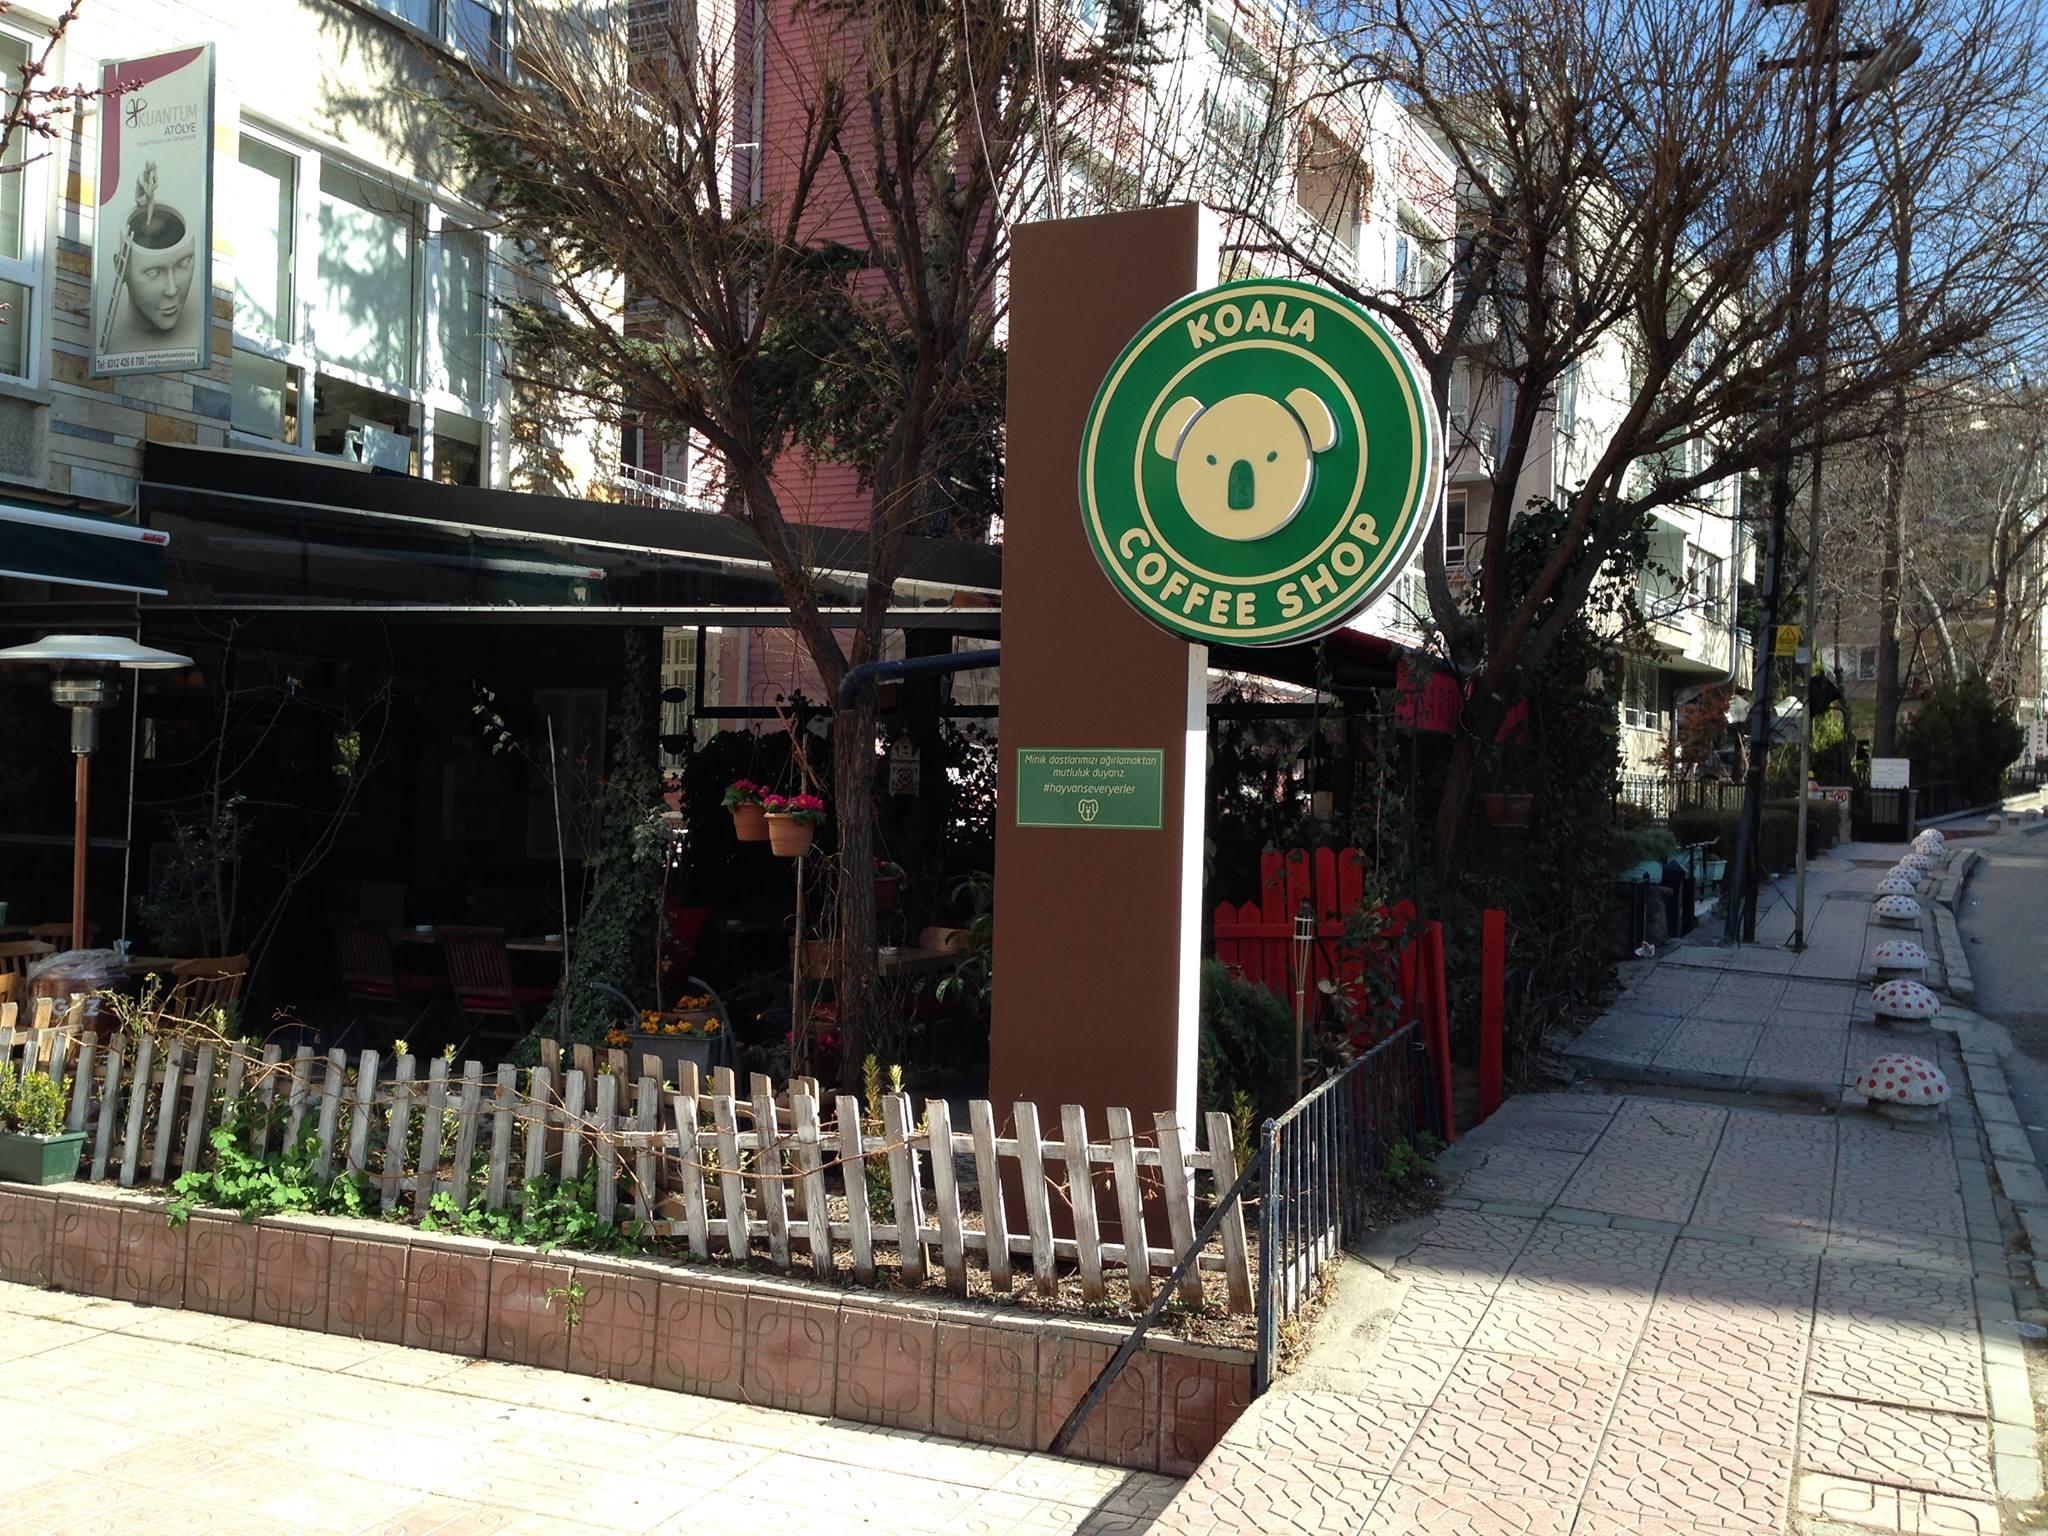 Ankara'dan Üçüncü Dalga Örneği: Koala Coffee Shop